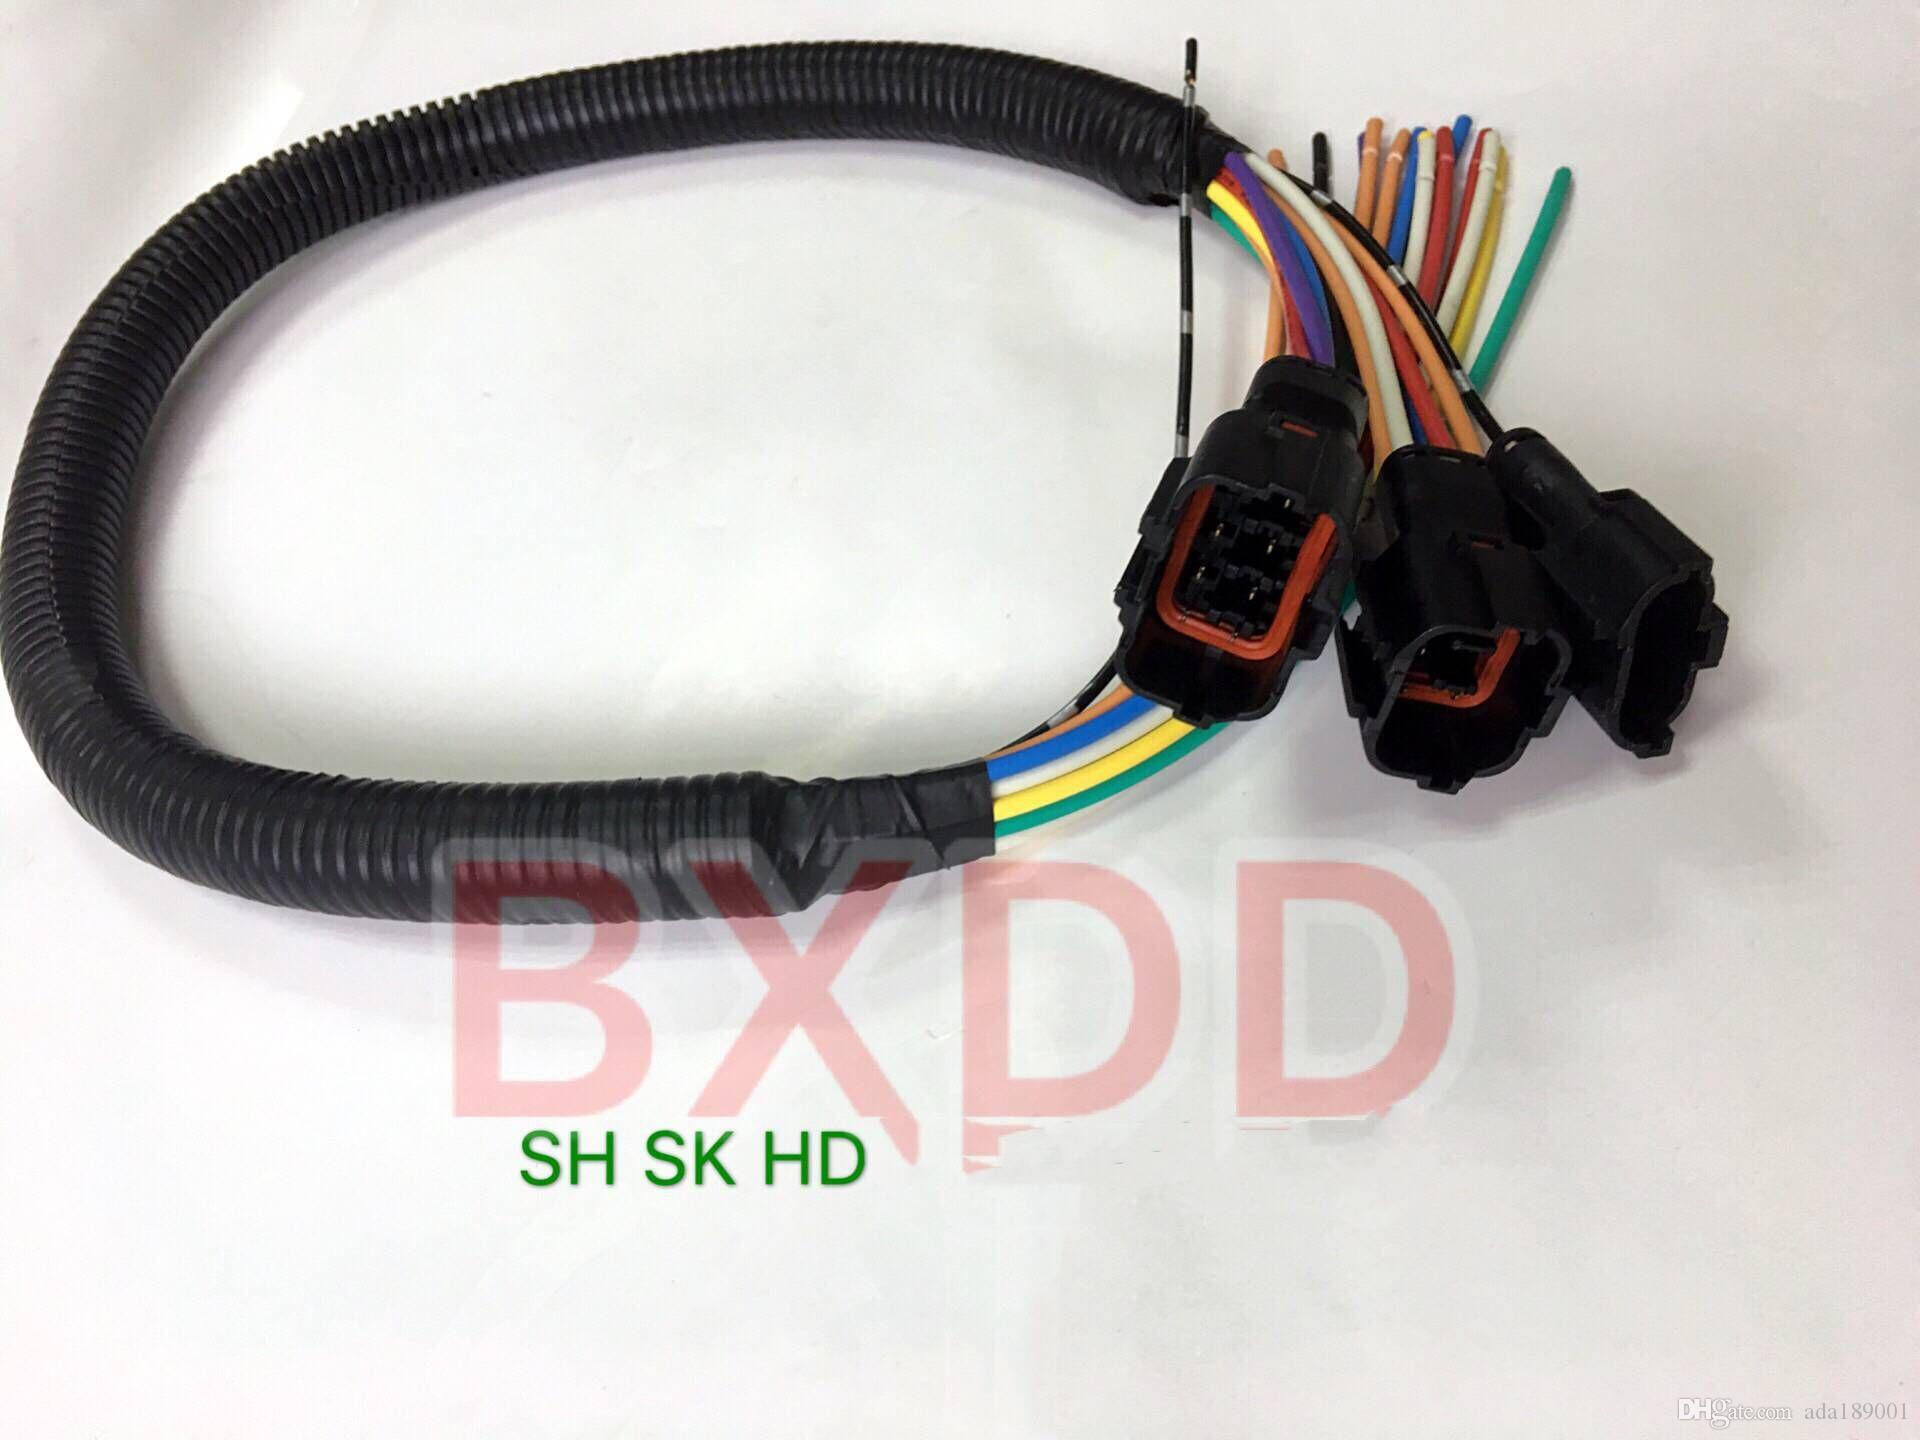 2018 Kobelco Excavator Electronic Pump Plug Wiring Harness 3 Lines Kobelco  Excavator Wiring Harness Outside Wiring Harness From Ada189001, $80.41 |  DHgate.